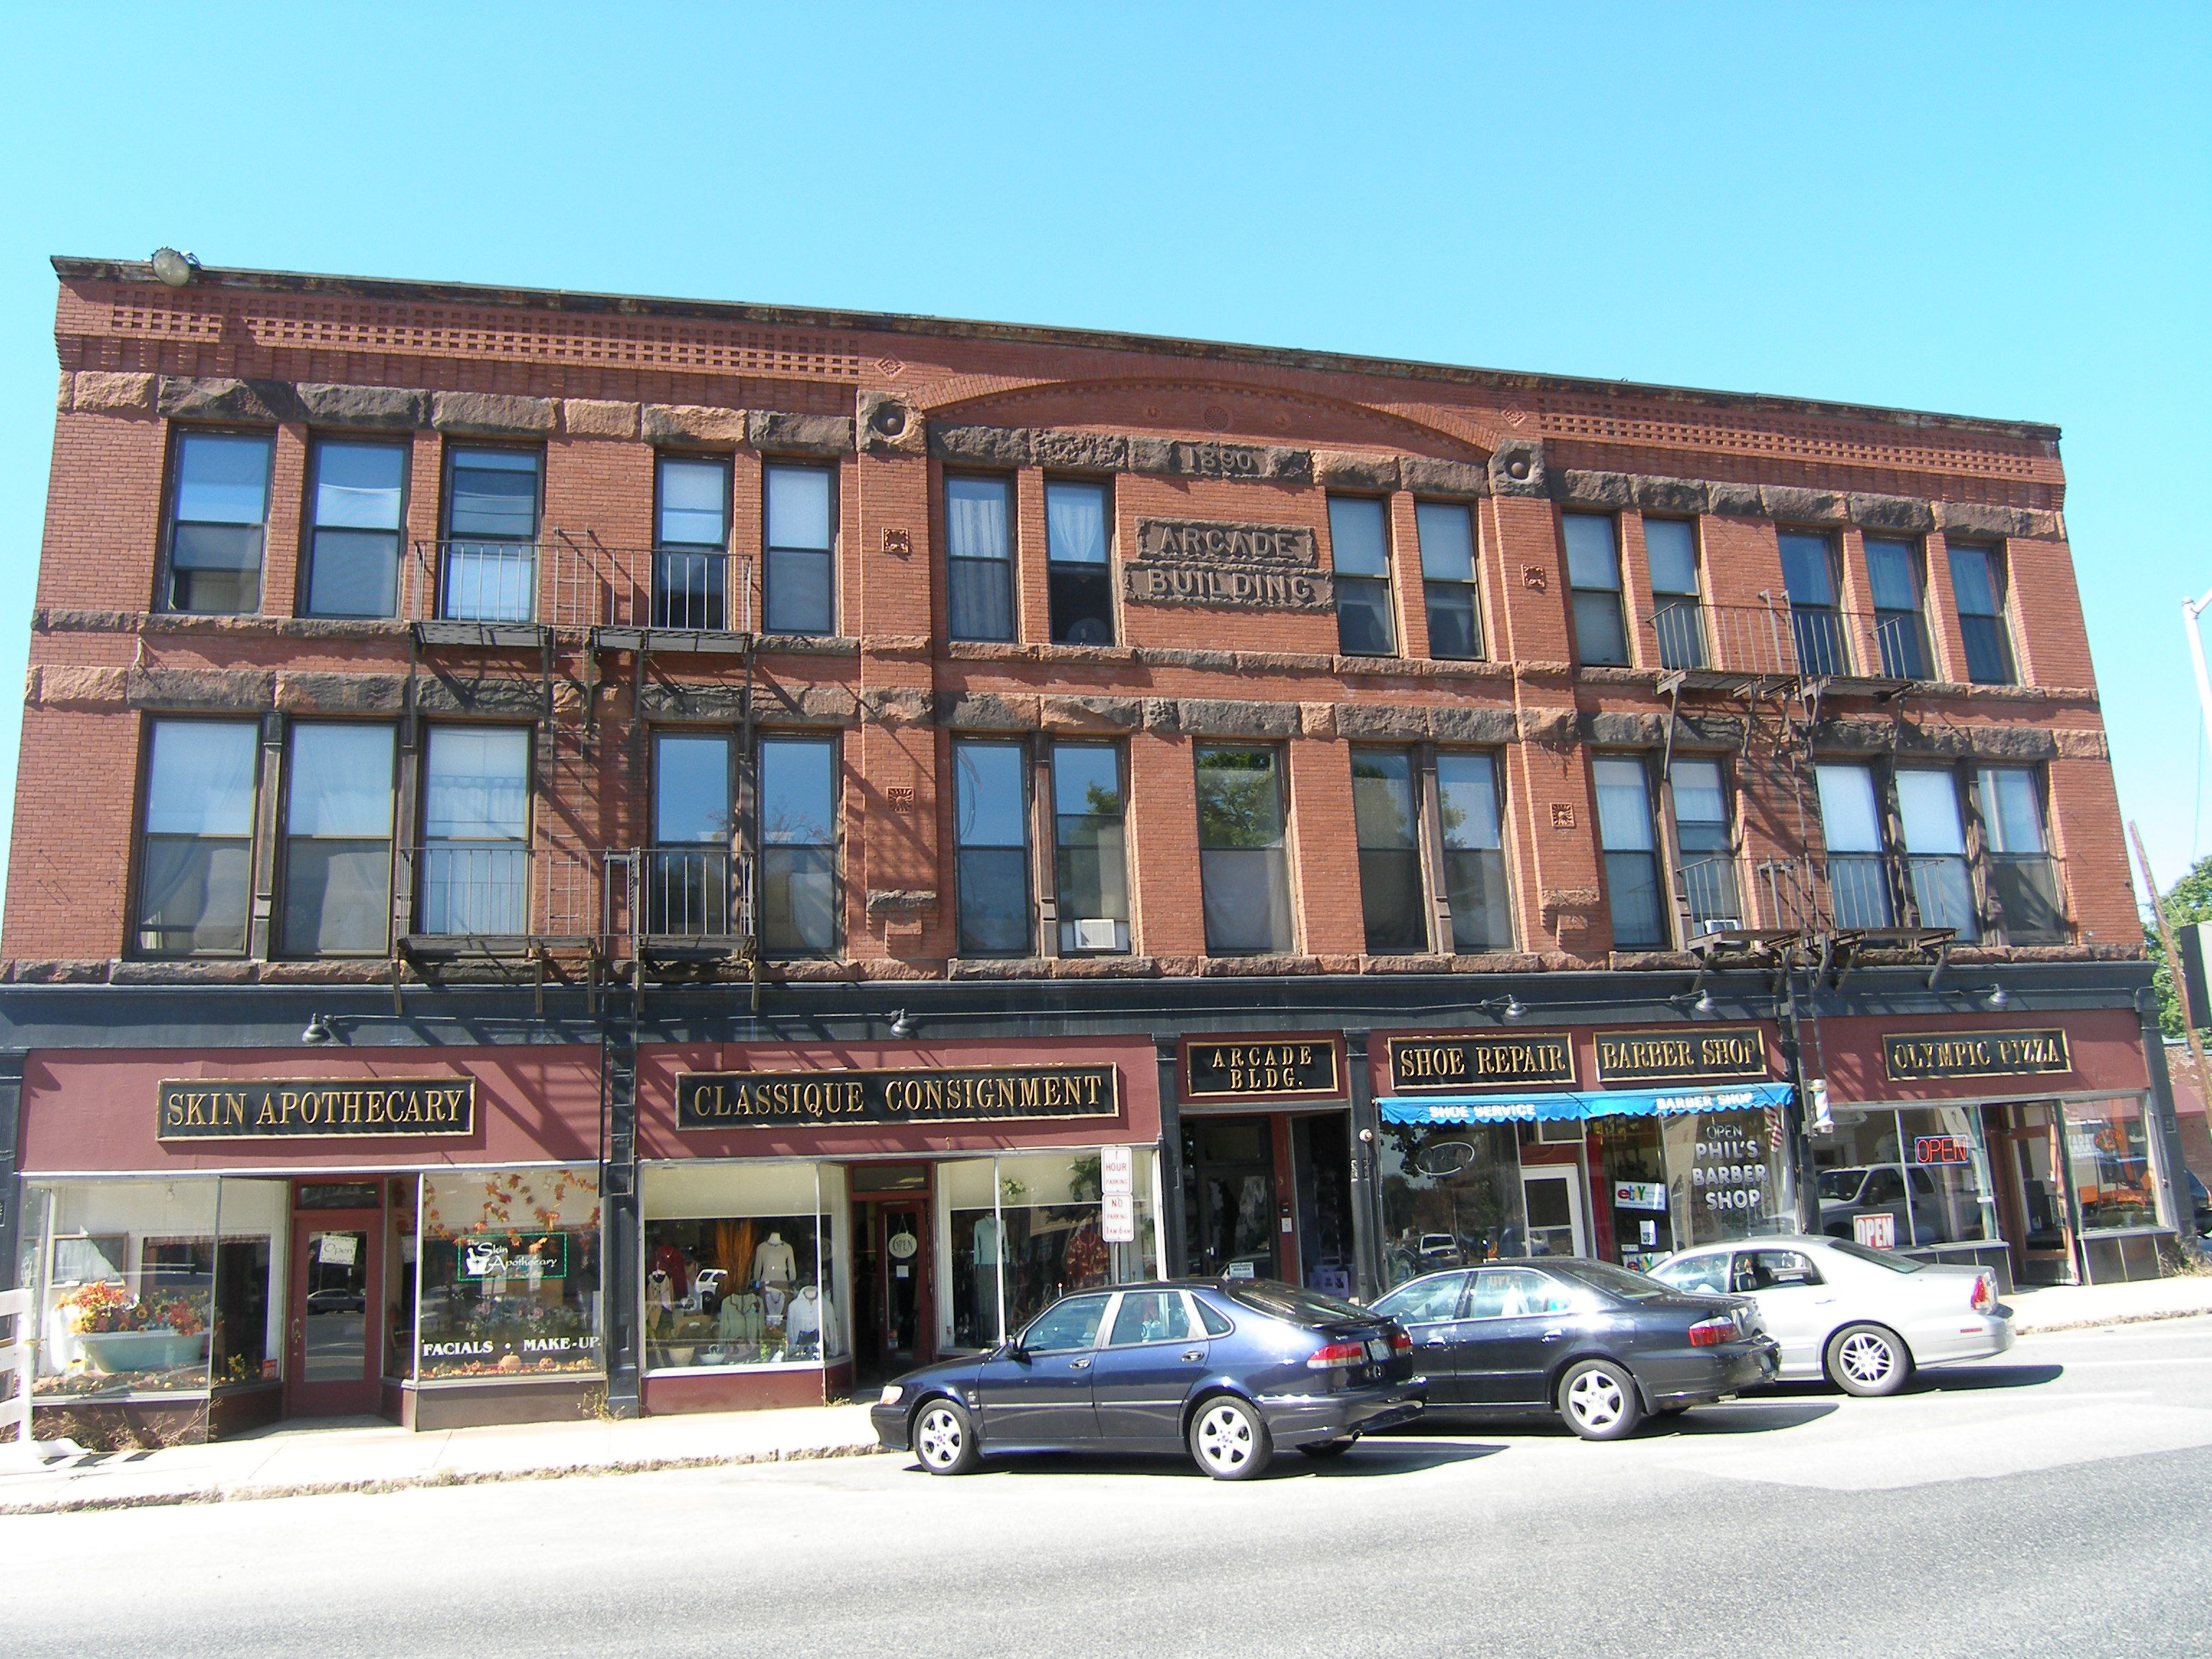 Arcade building in Westborough Massachusetts town center